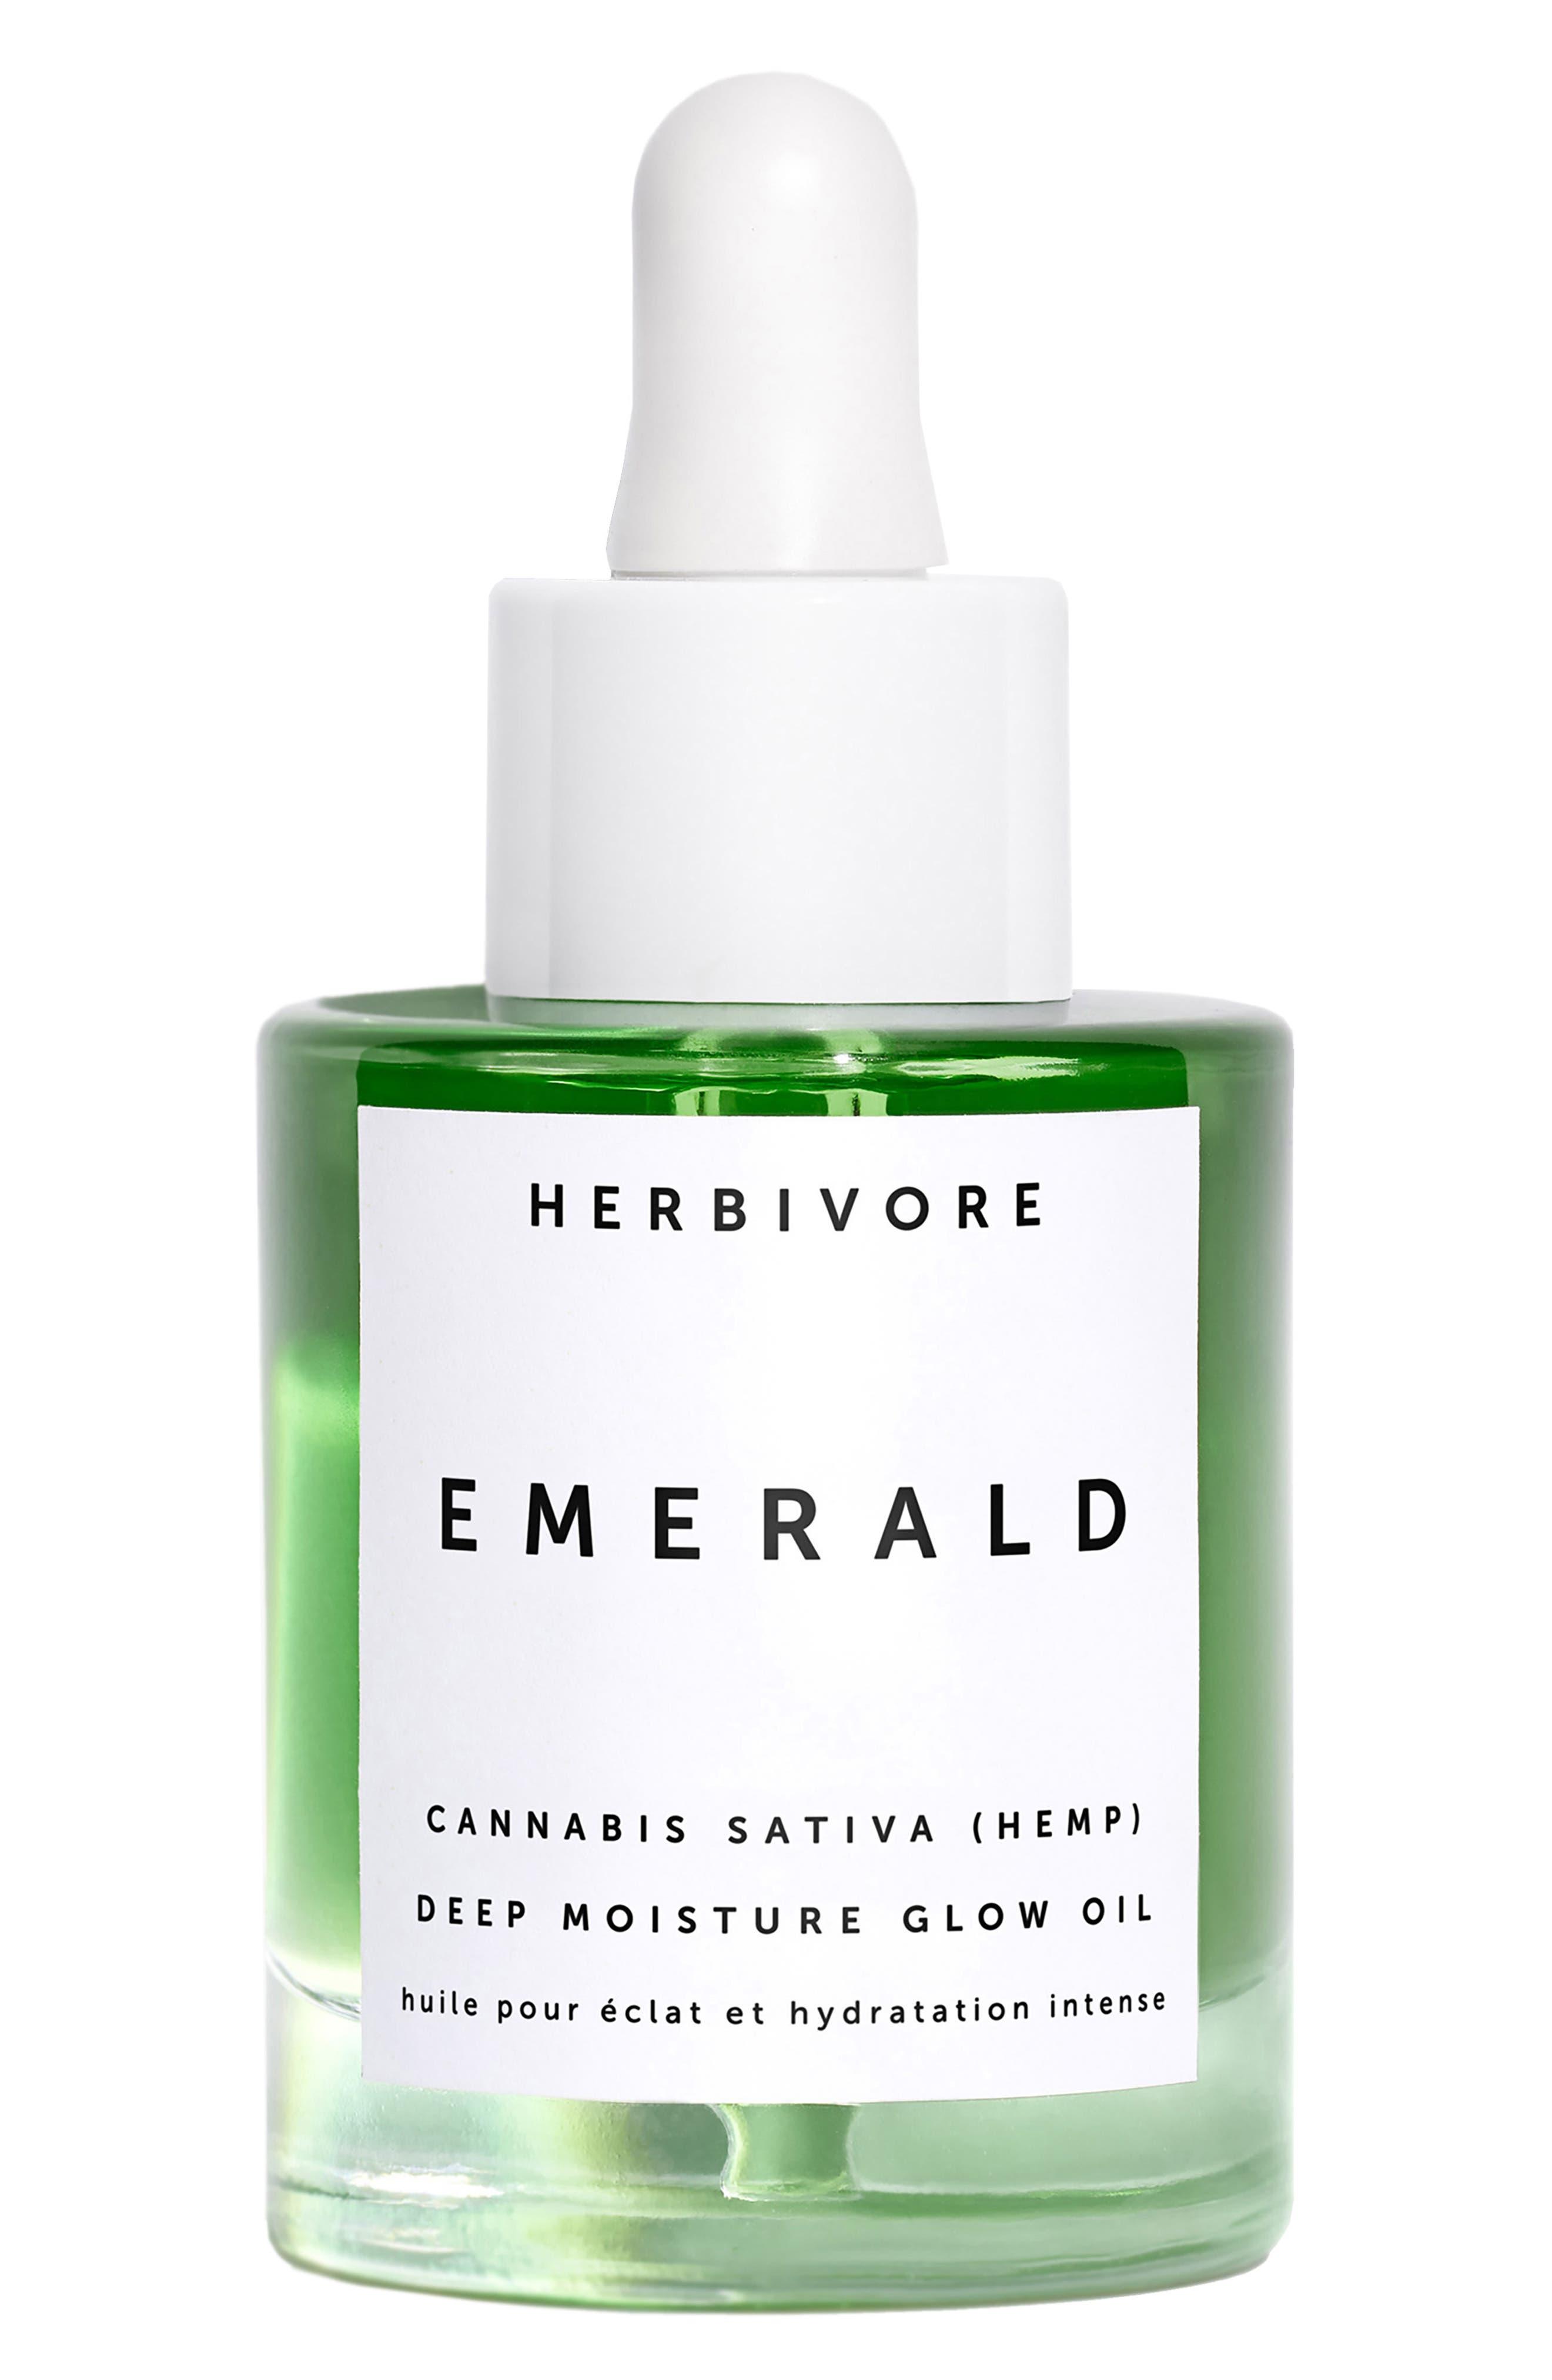 Emerald Deep Moisture Glow Oil